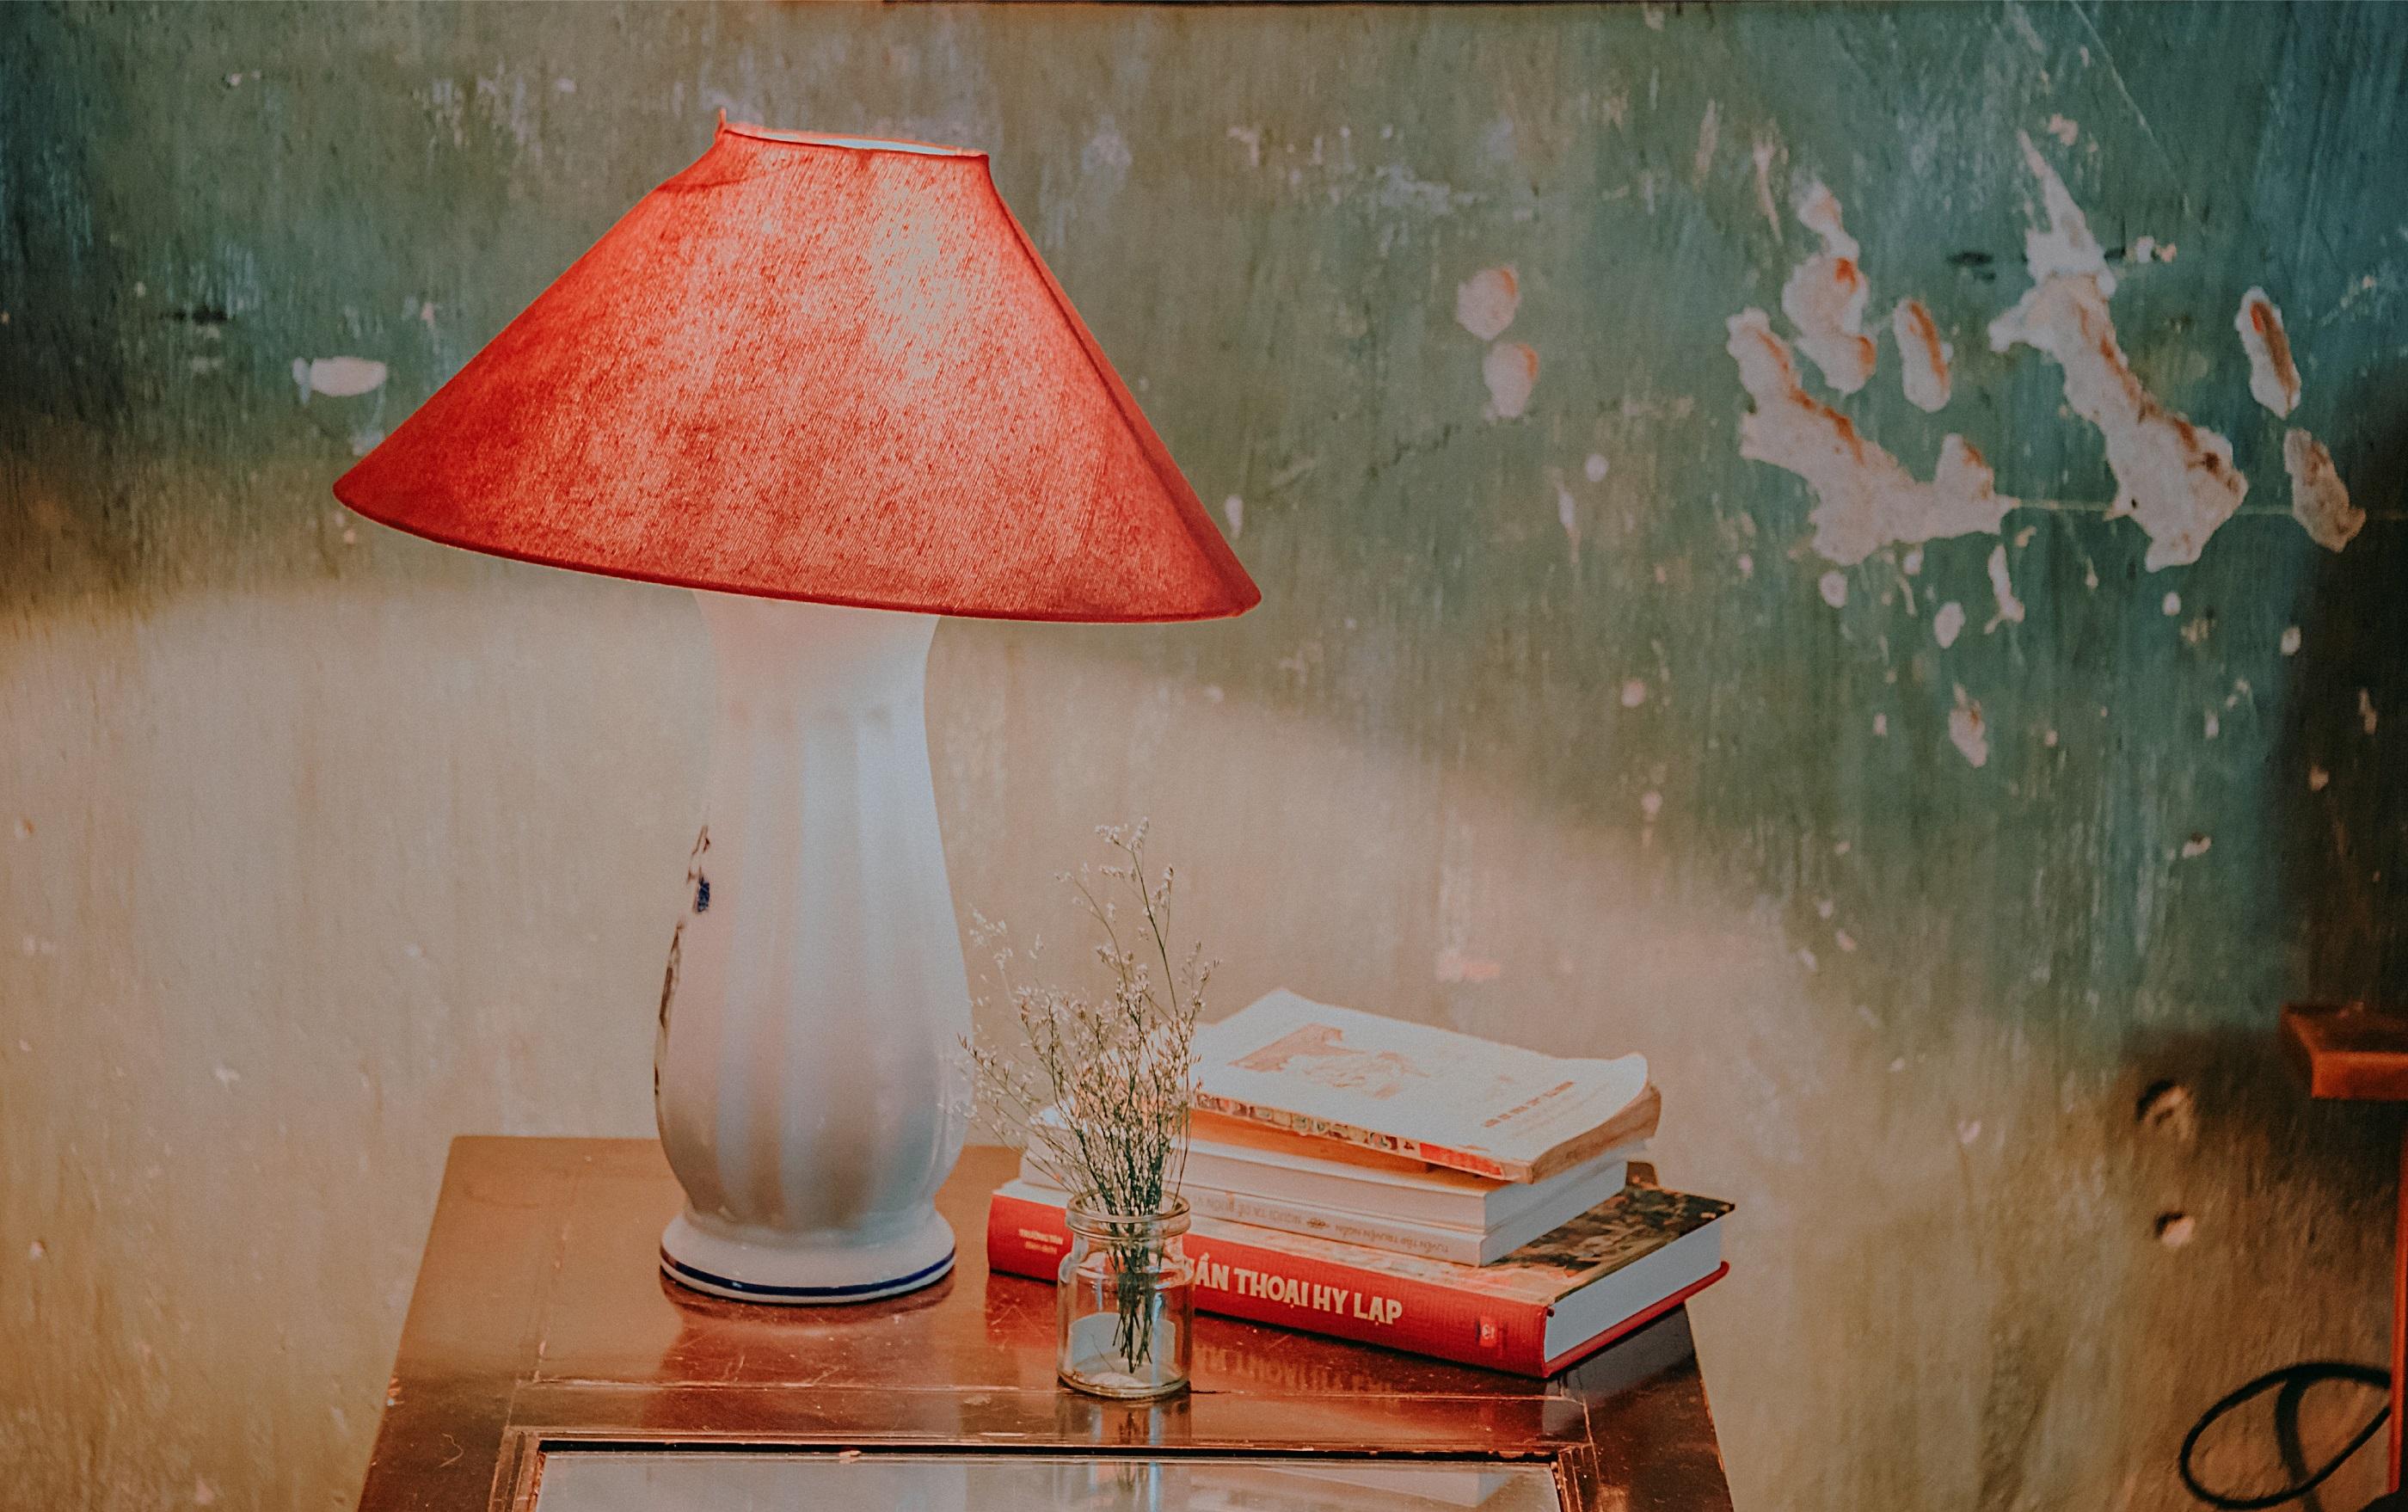 books-design-desk-lamp-1441596